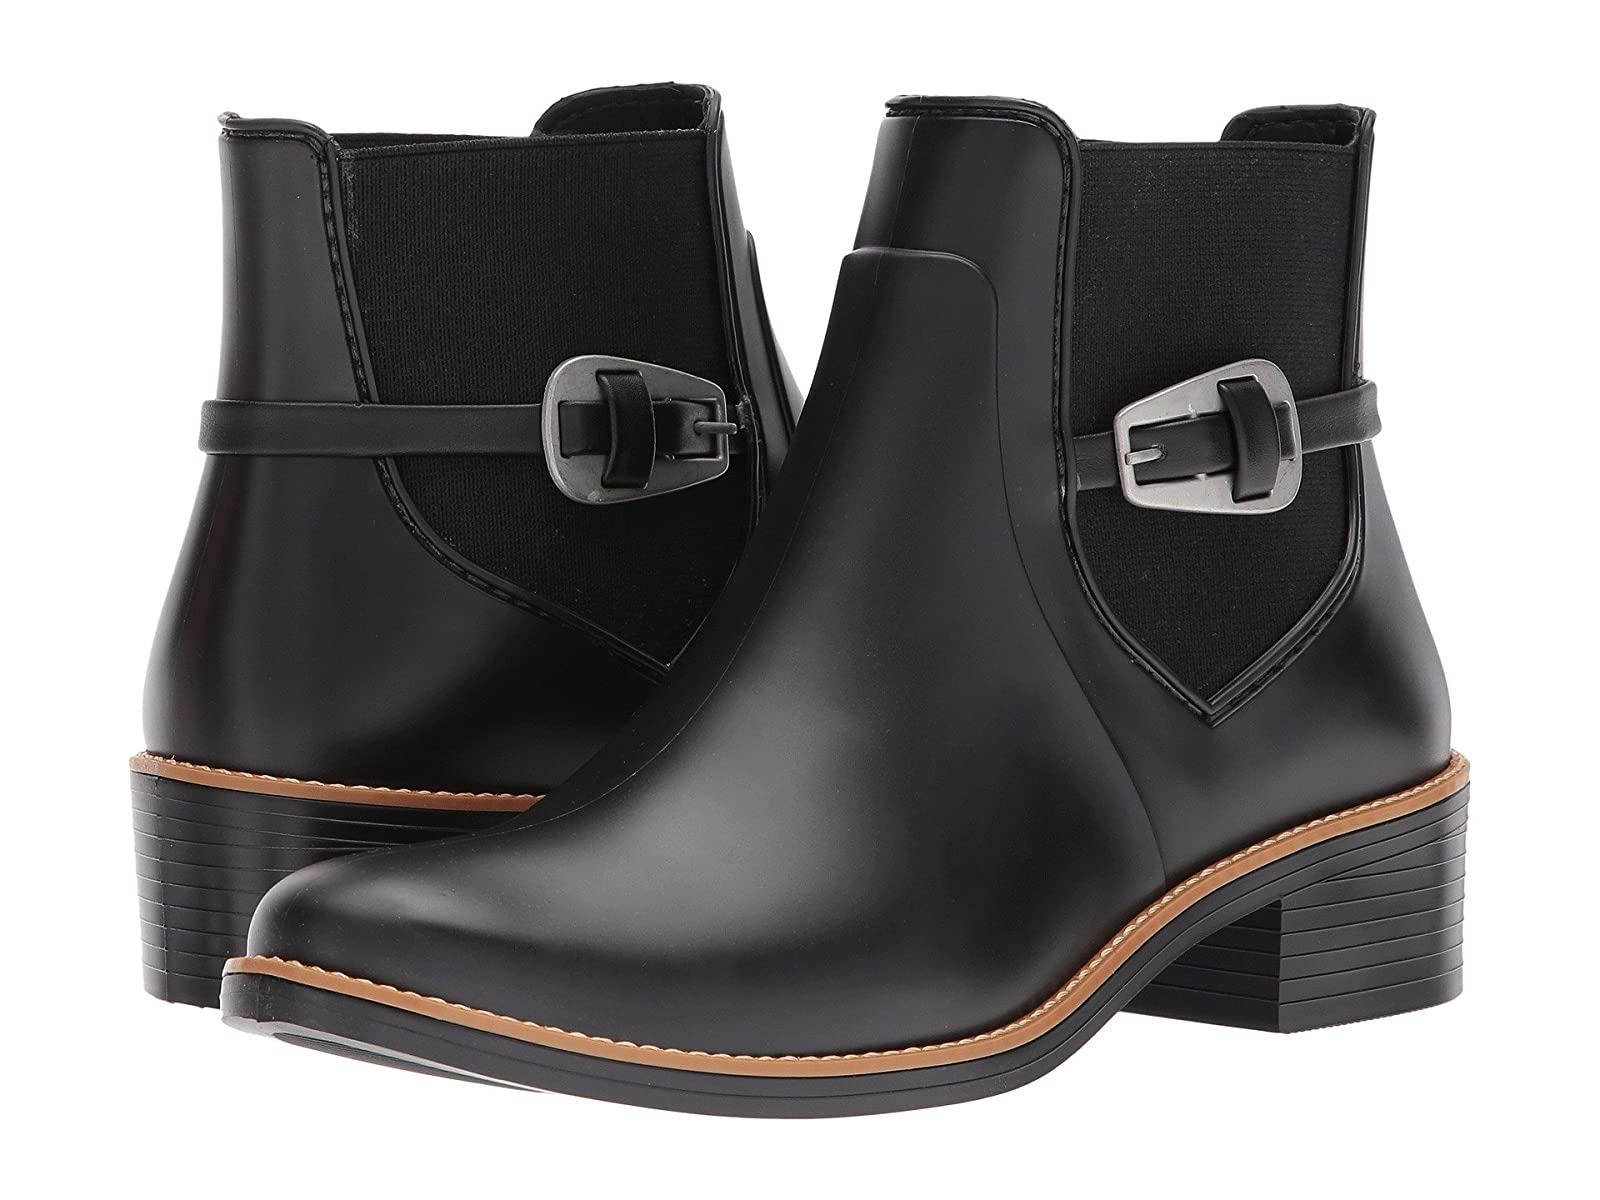 Bernardo Pansie RainCheap and distinctive eye-catching shoes